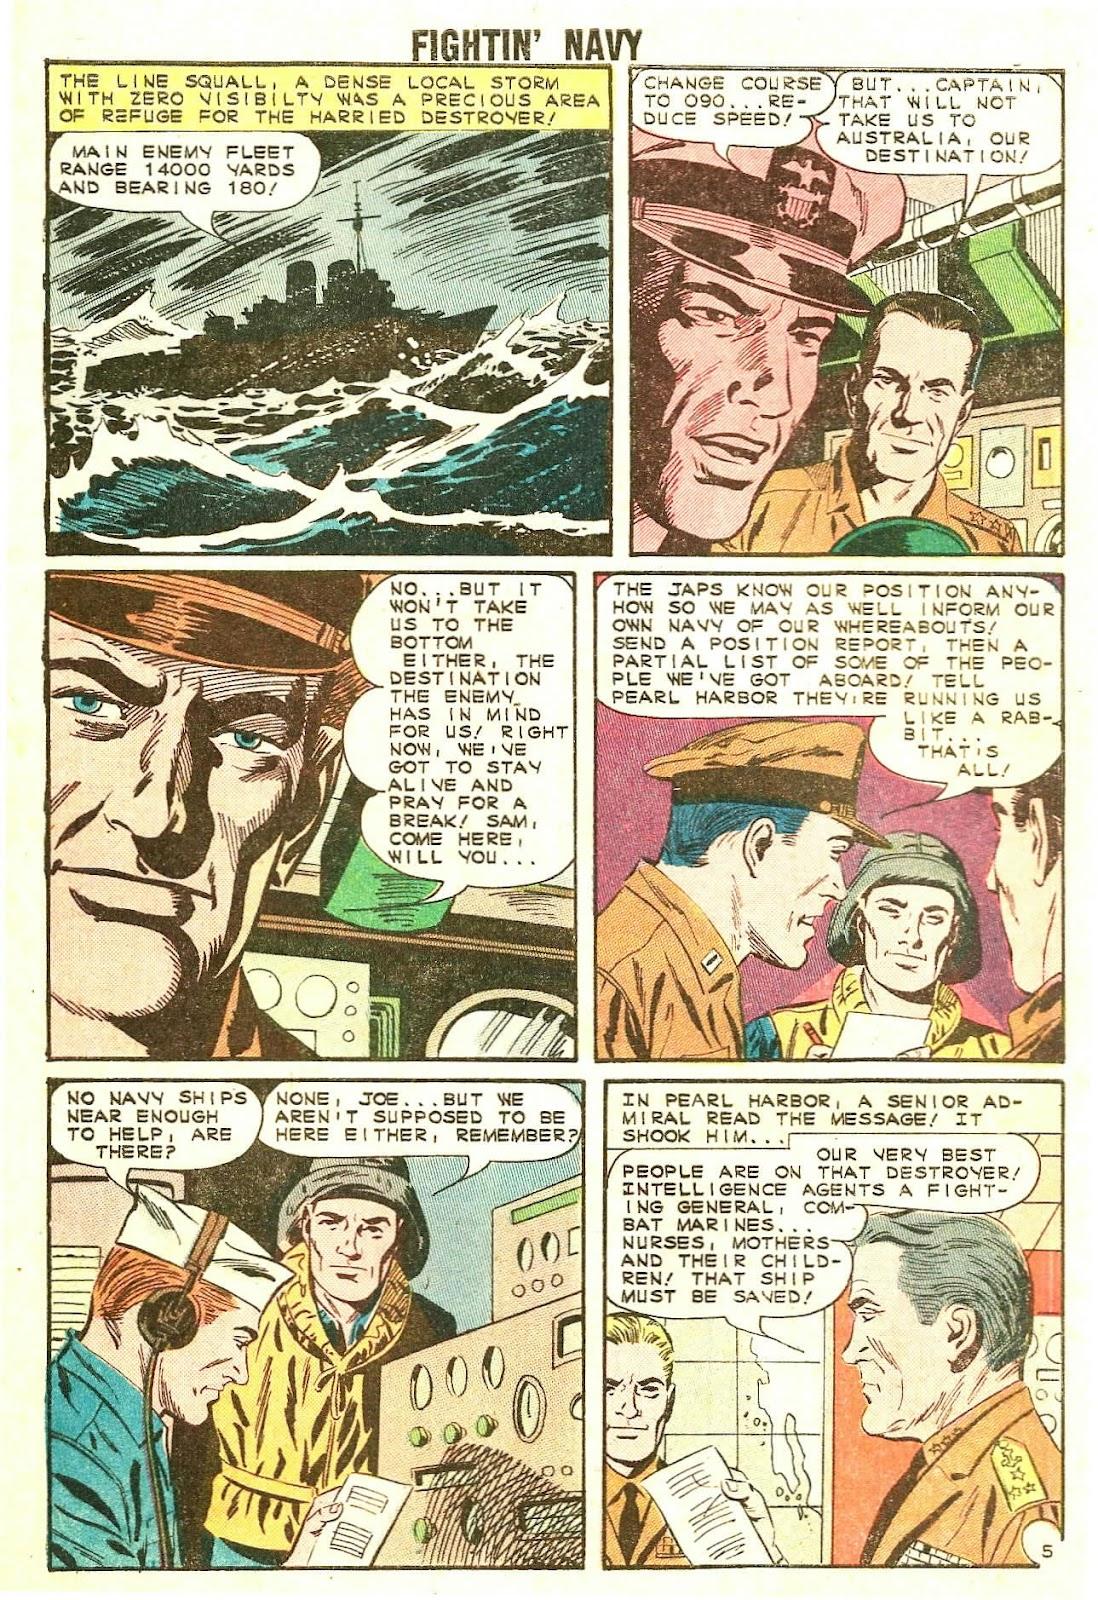 Read online Fightin' Navy comic -  Issue #114 - 8